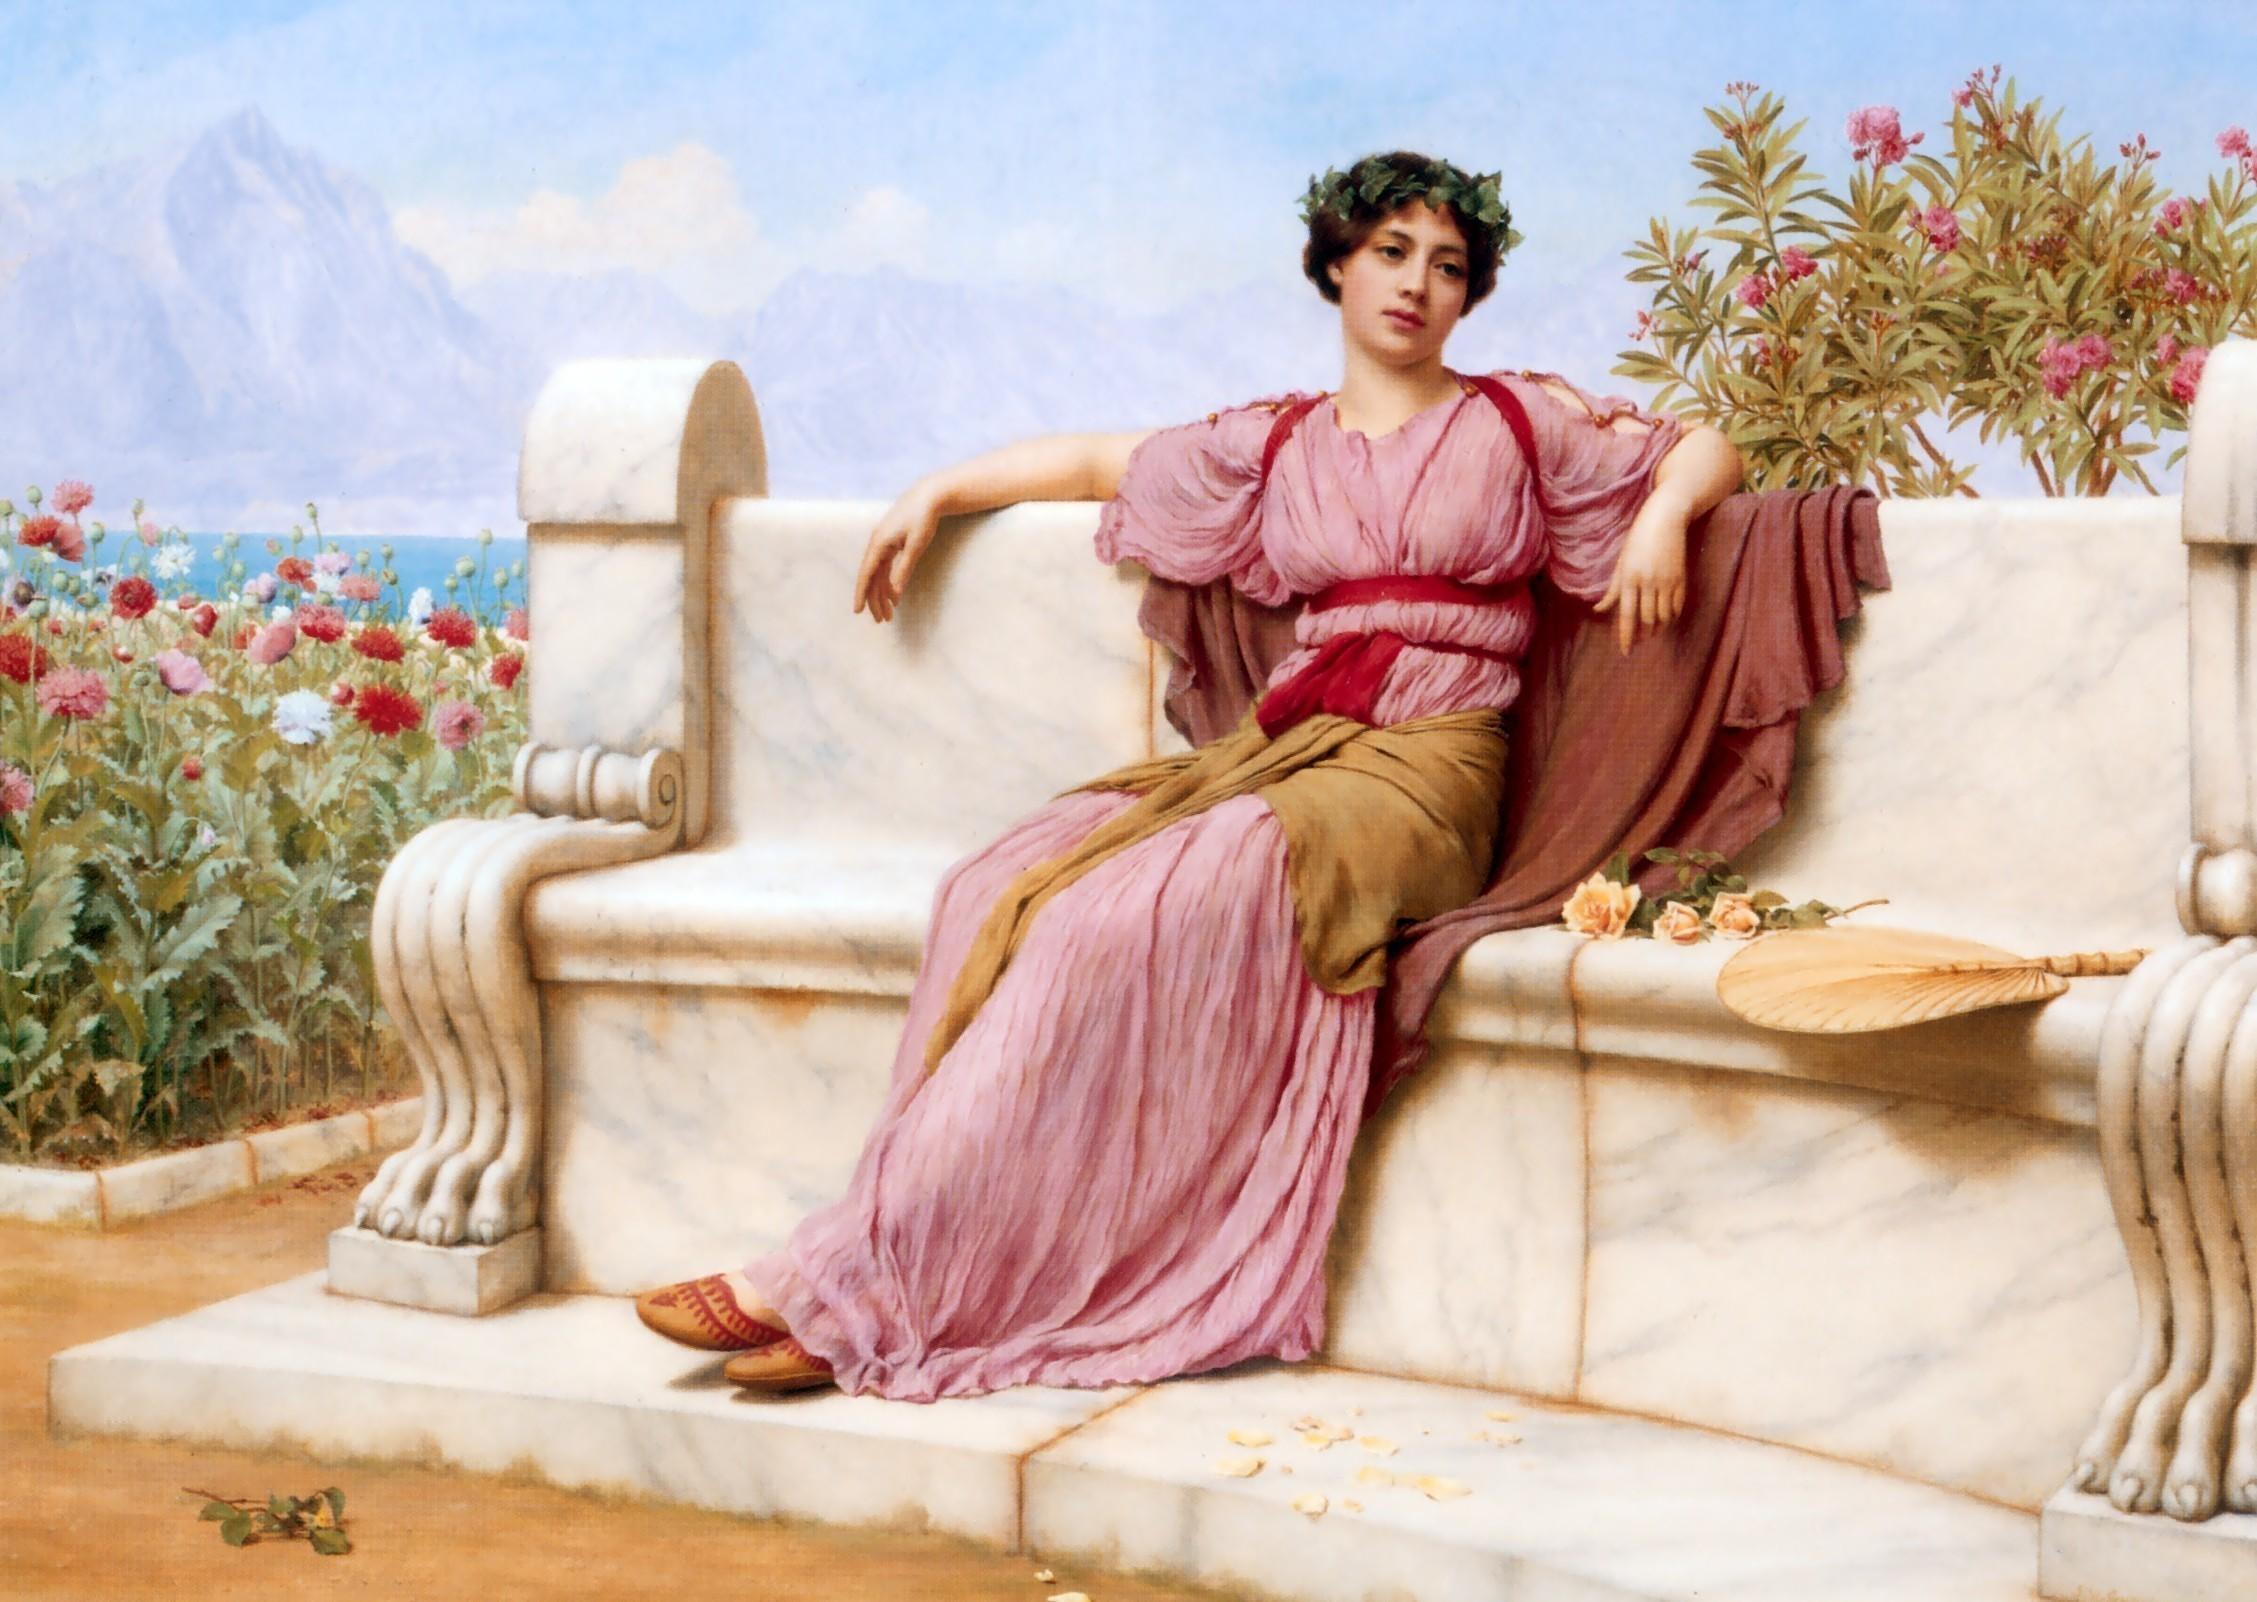 картина Спокойствие (Tranquillity) :: Джон Уильям Годвард - Древний Рим и Греция, Египет фото